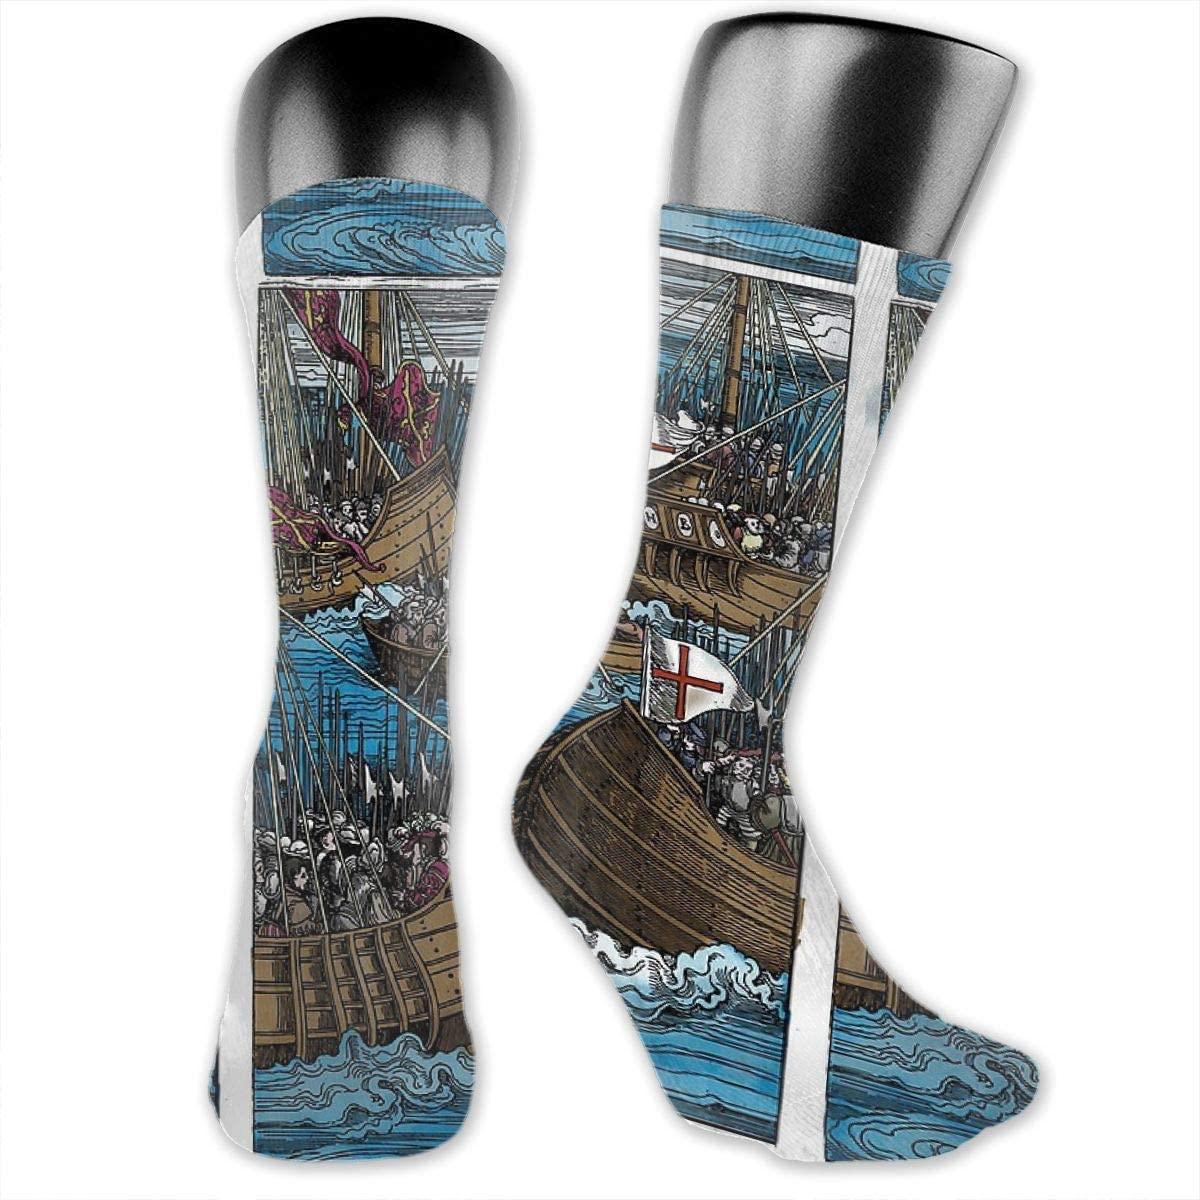 Unisex Crazy Funny Woodcut - Naval Battle Socks Colorful Athletic Sport Socks Novelty Casual Crew Socks